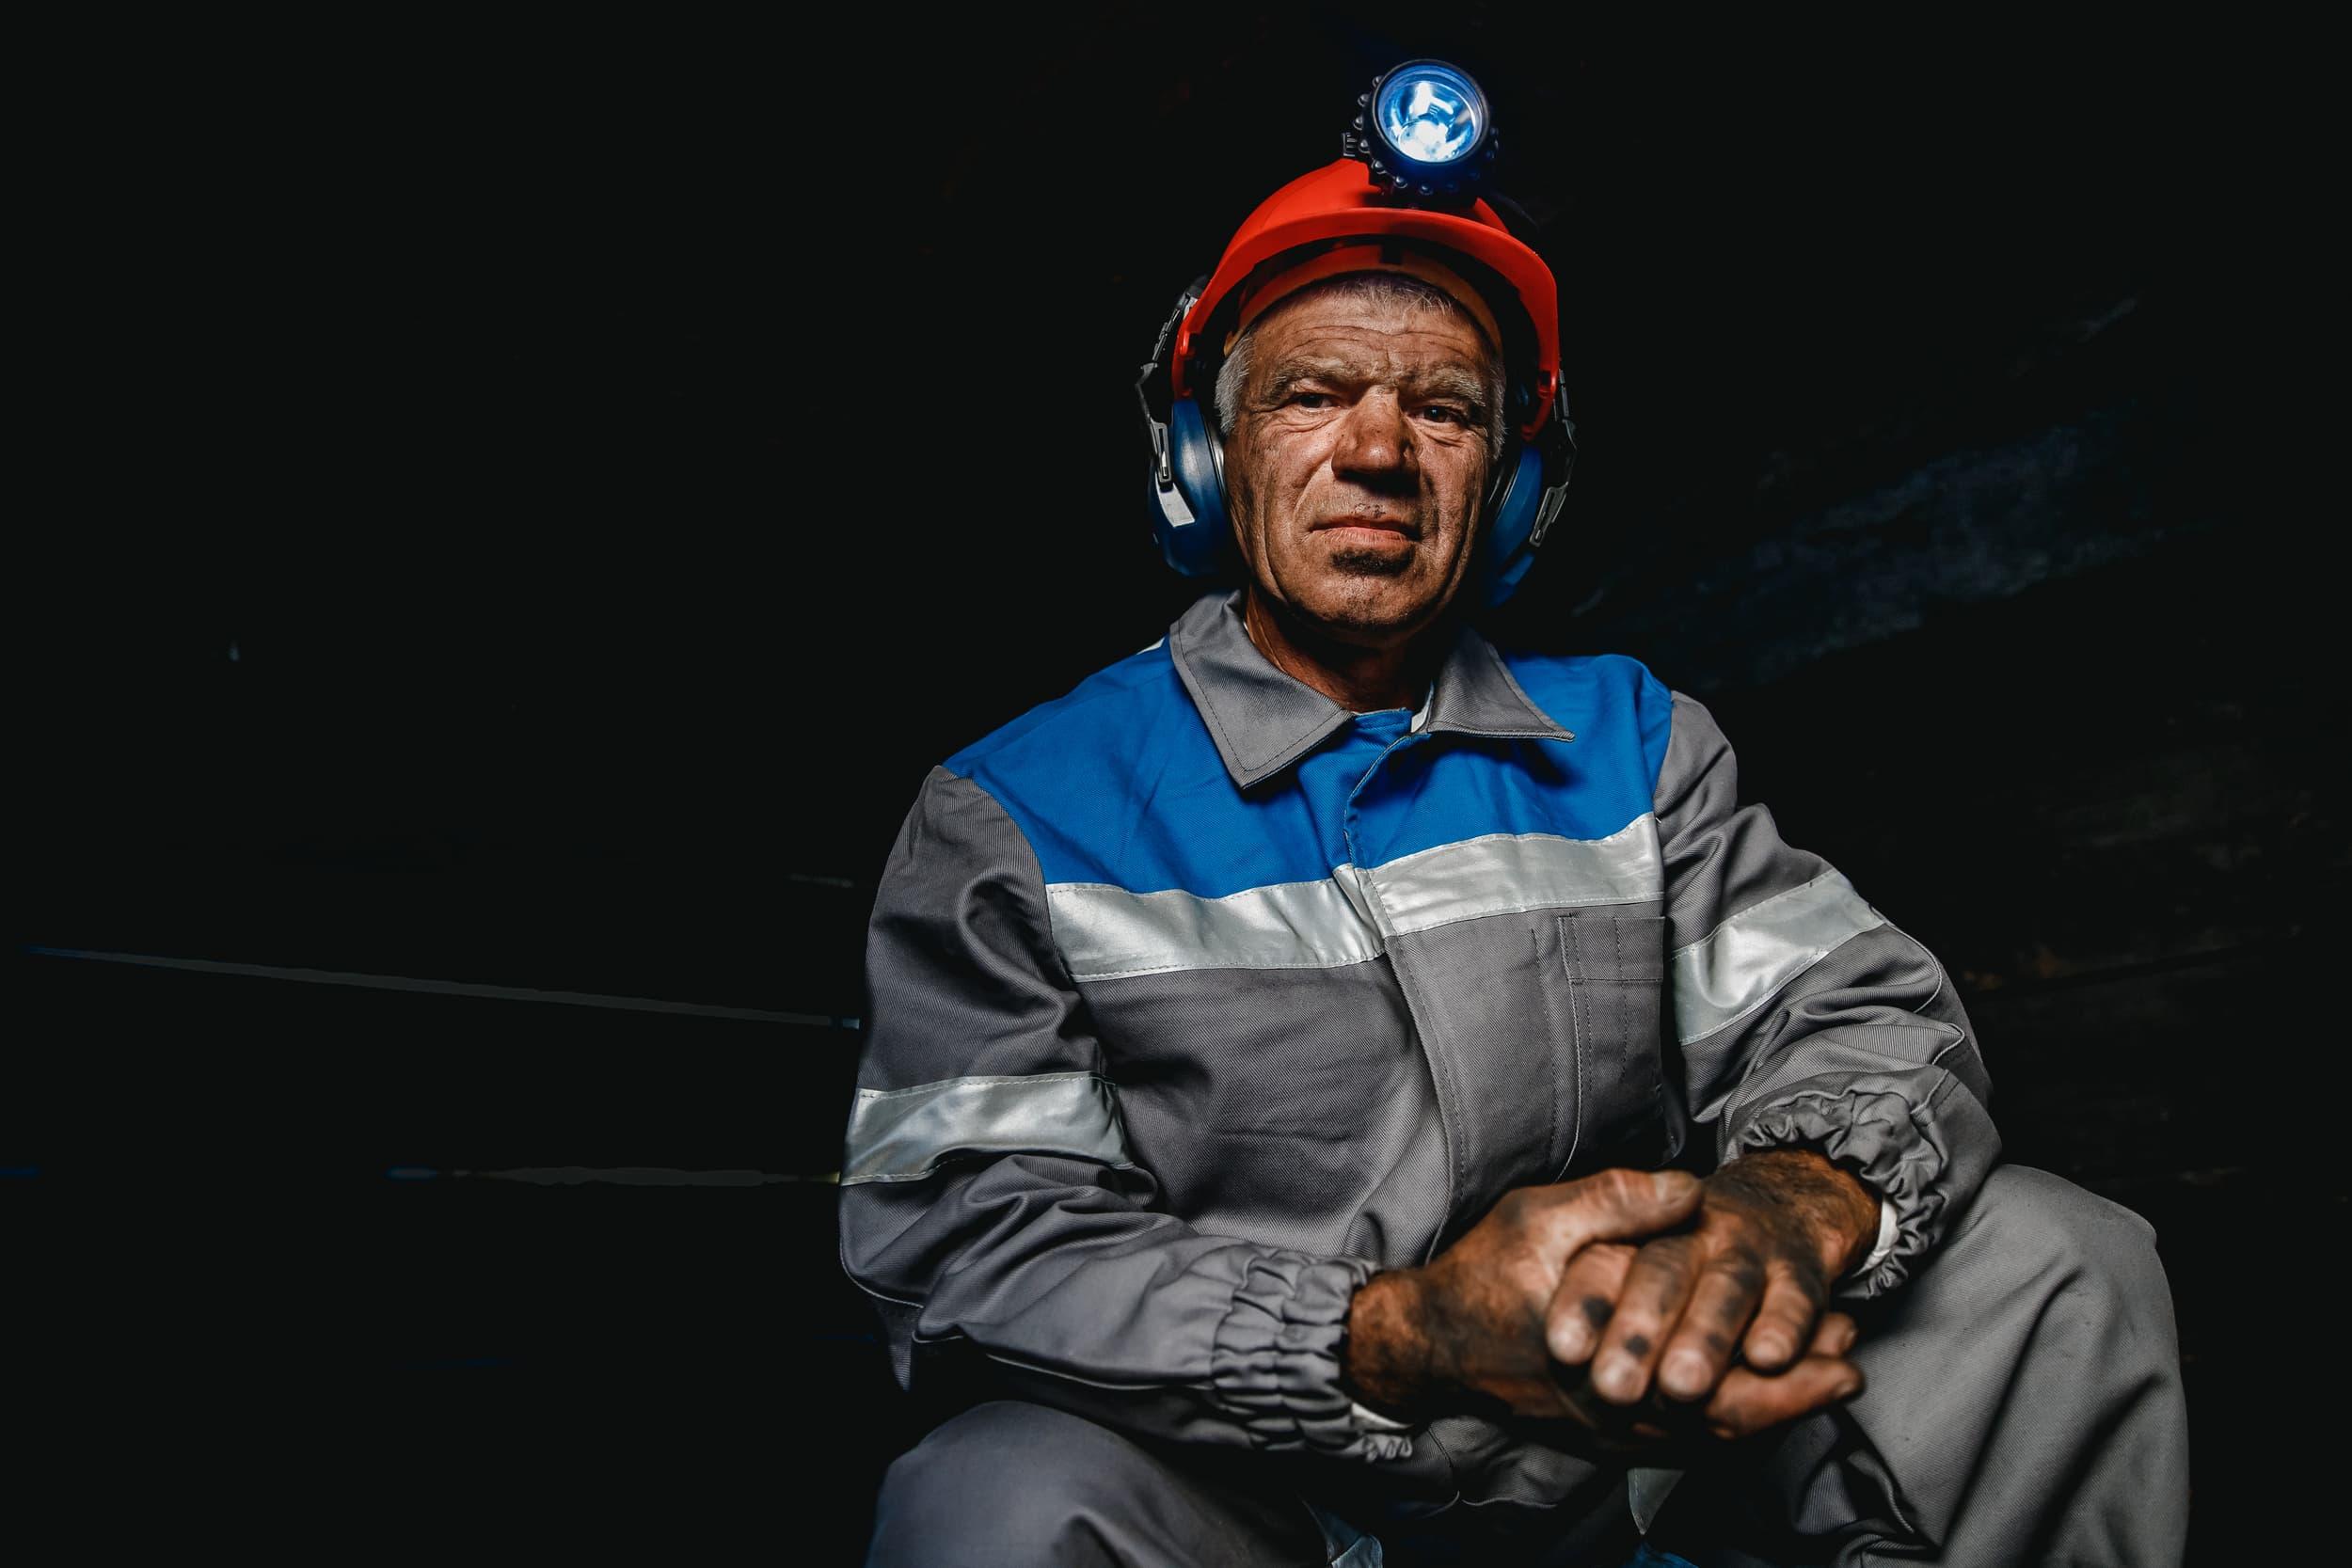 Compliance Training Online MSHA Part 48 Underground Mining Refresher course